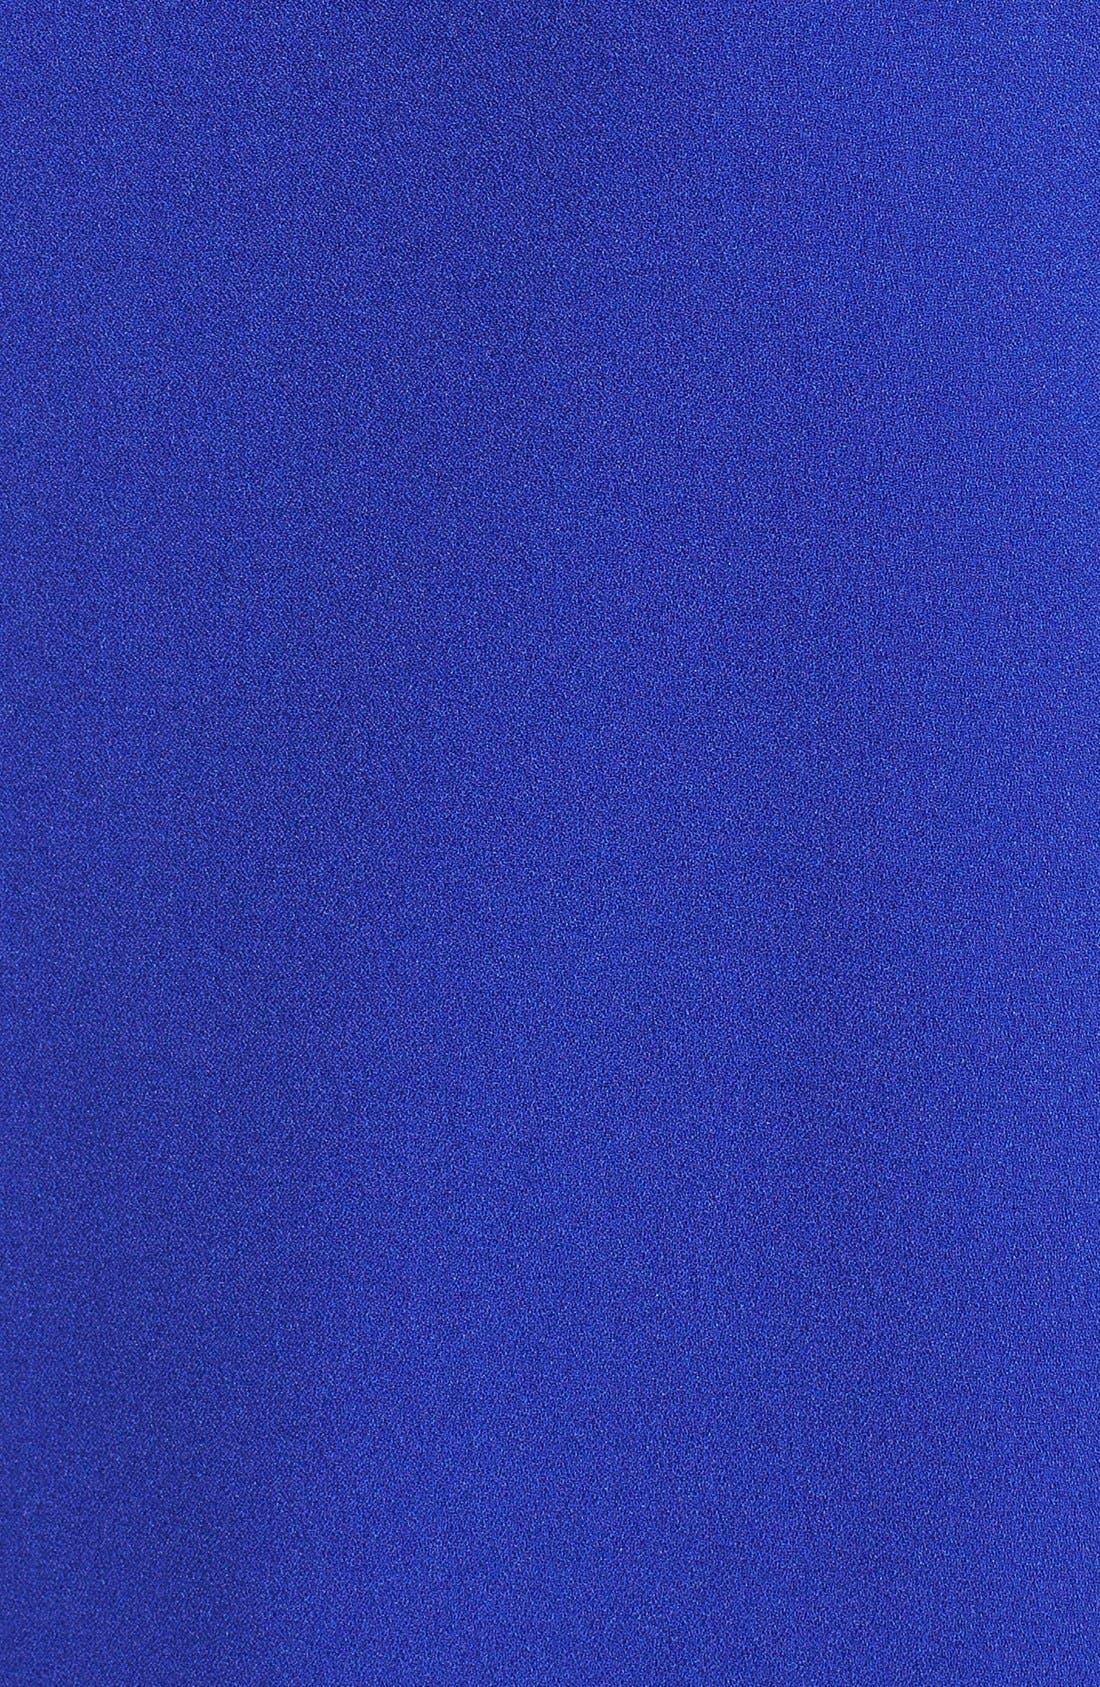 Alternate Image 5  - Chelsea28 'Peek-A-Boo' Cold Shoulder Shift Dress